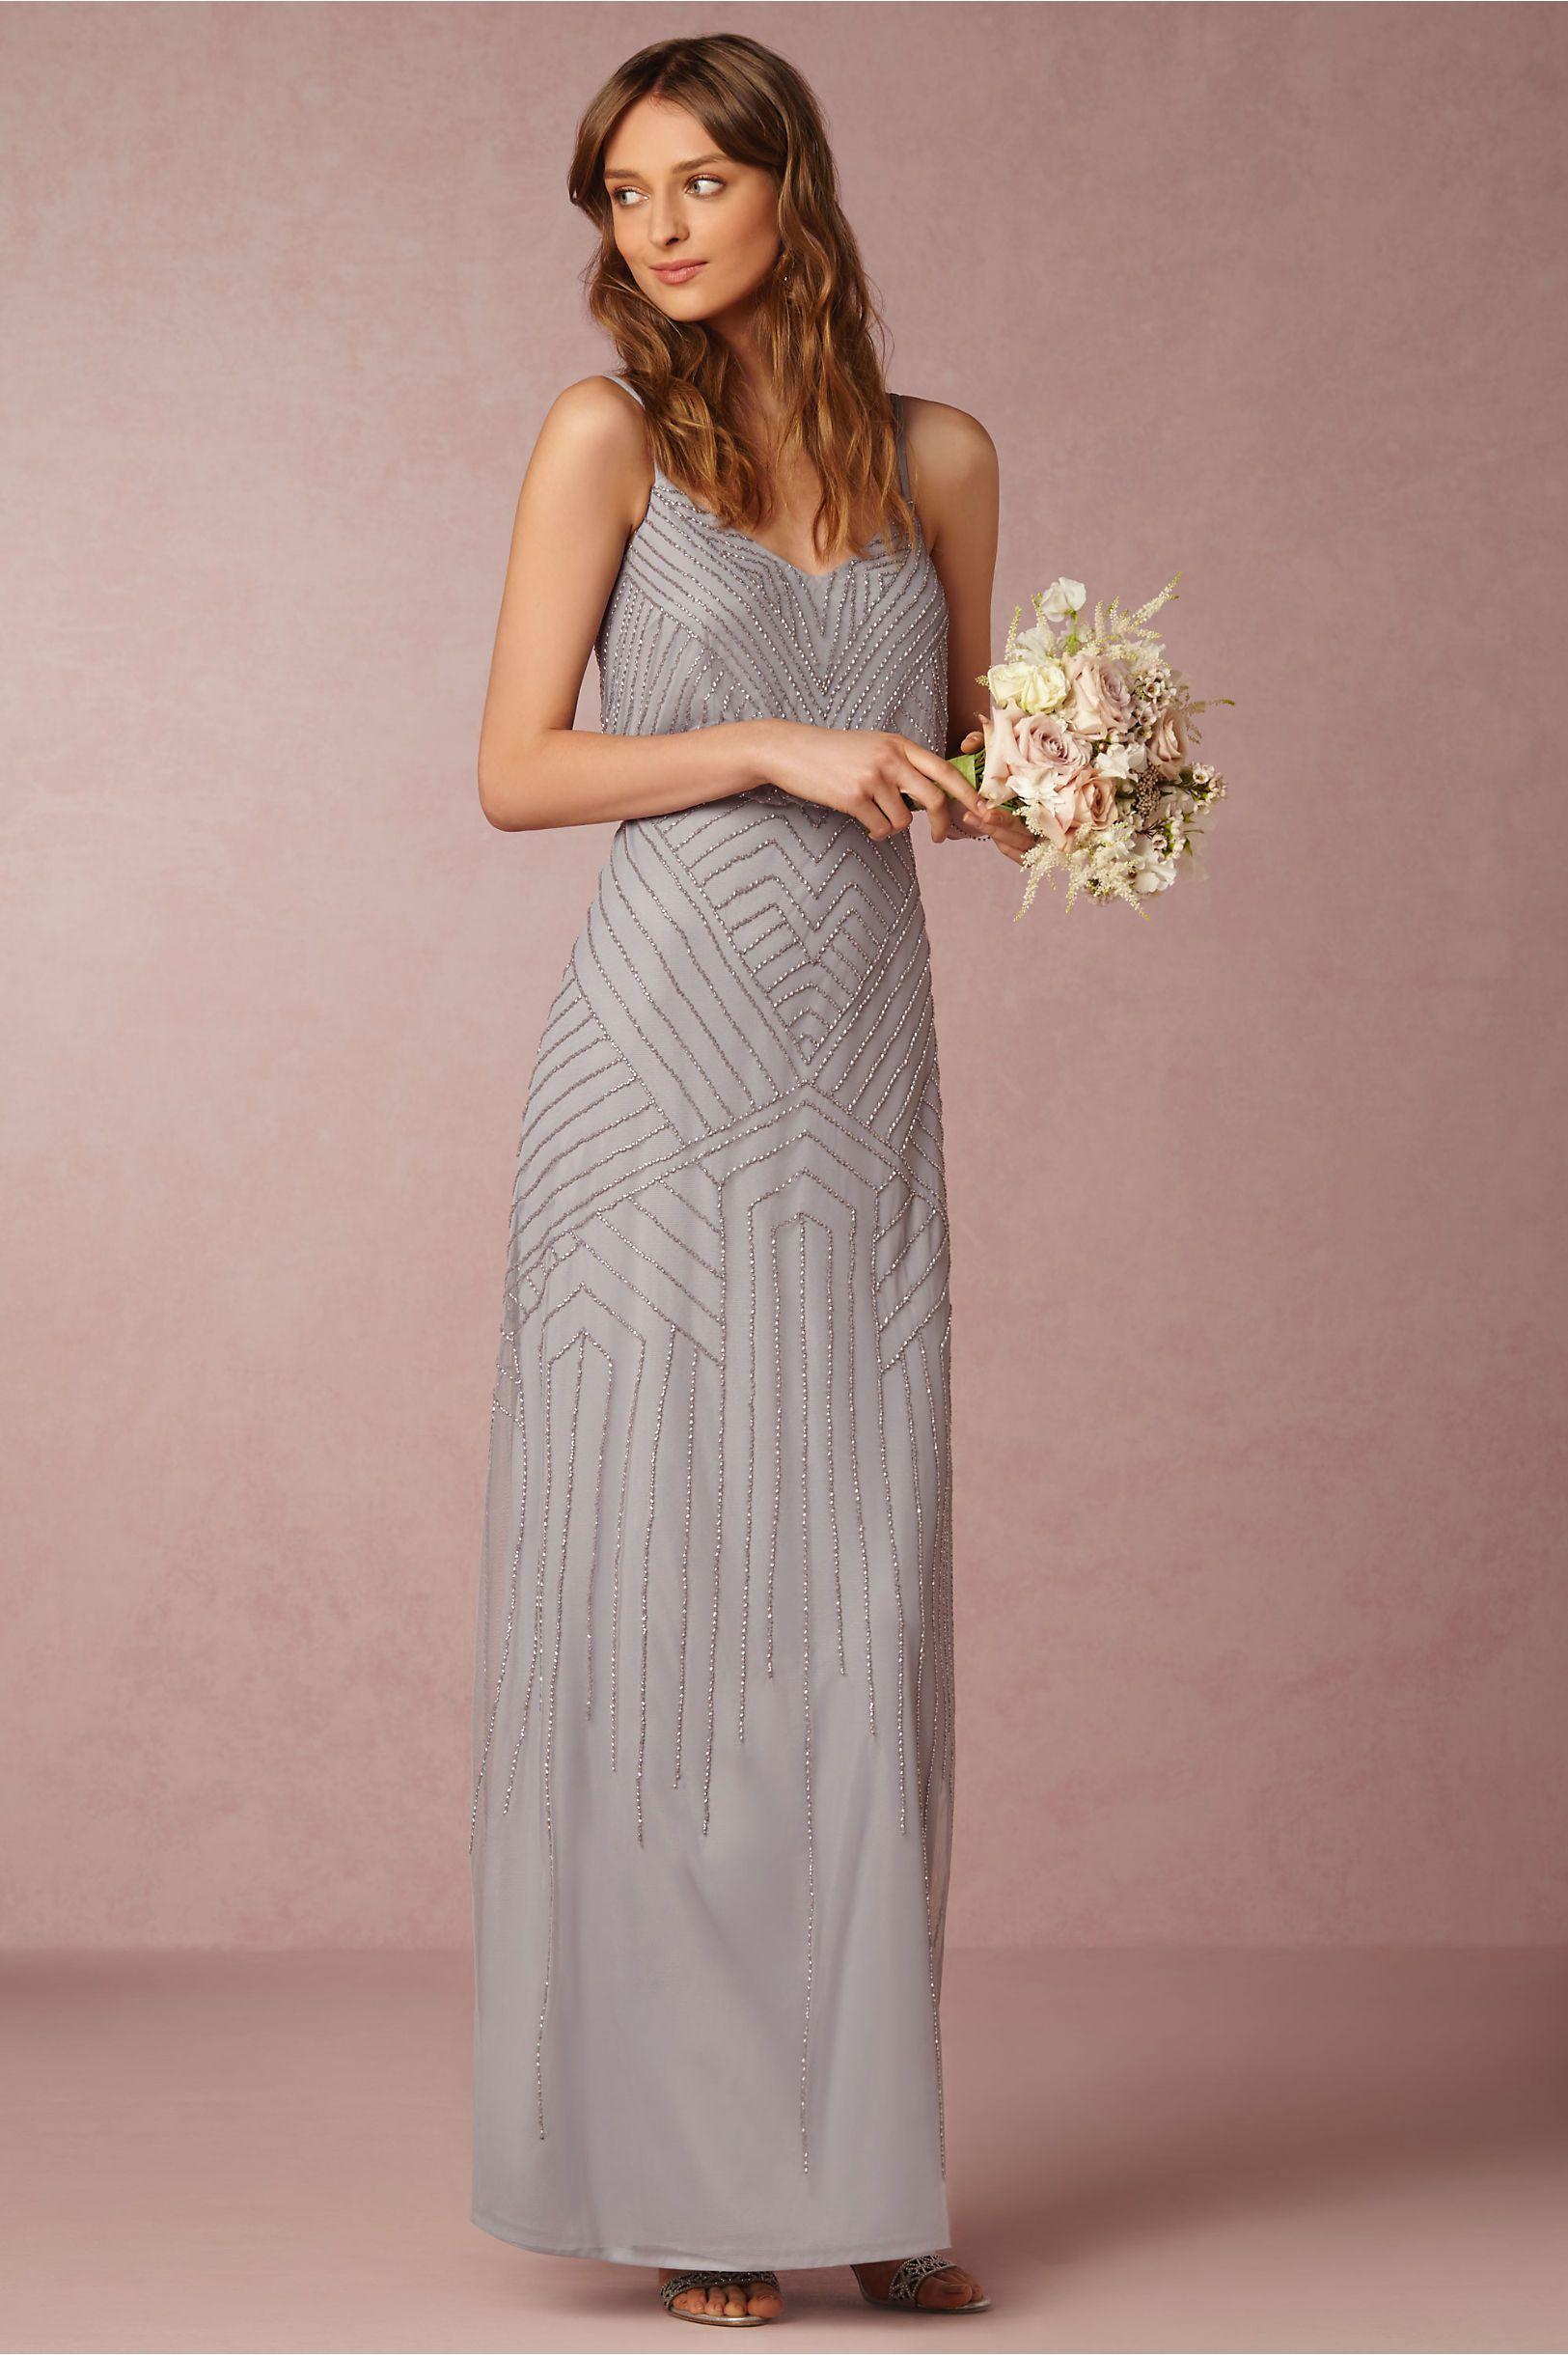 Long wedding reception dresses for the bride   BHLDN Sophia Dress in Bride Reception u Rehearsal Dresses